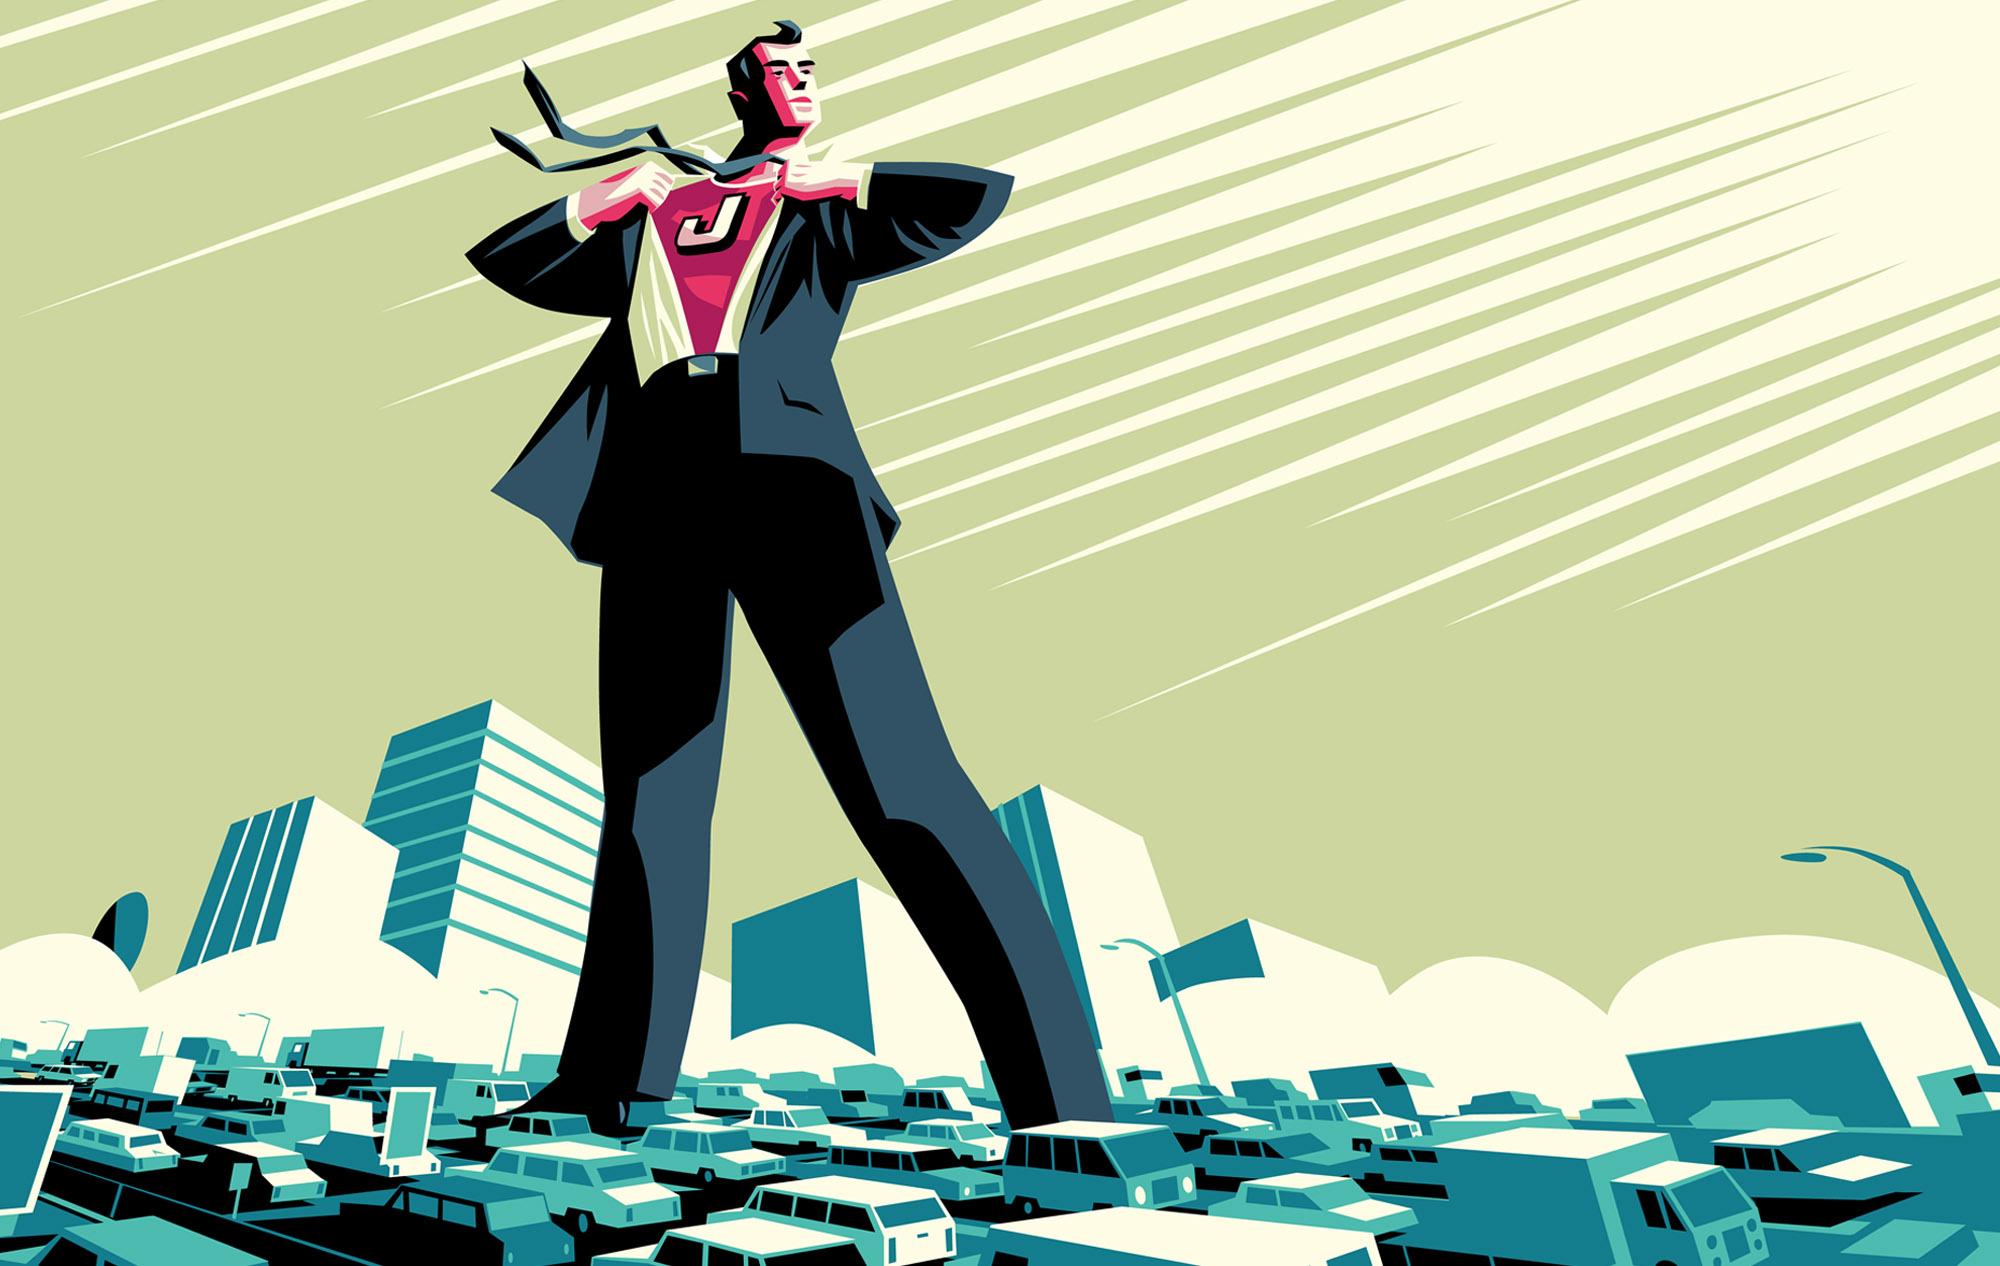 Commuter Superhero stands astride city-Dean Gorissen Illustration.jpg